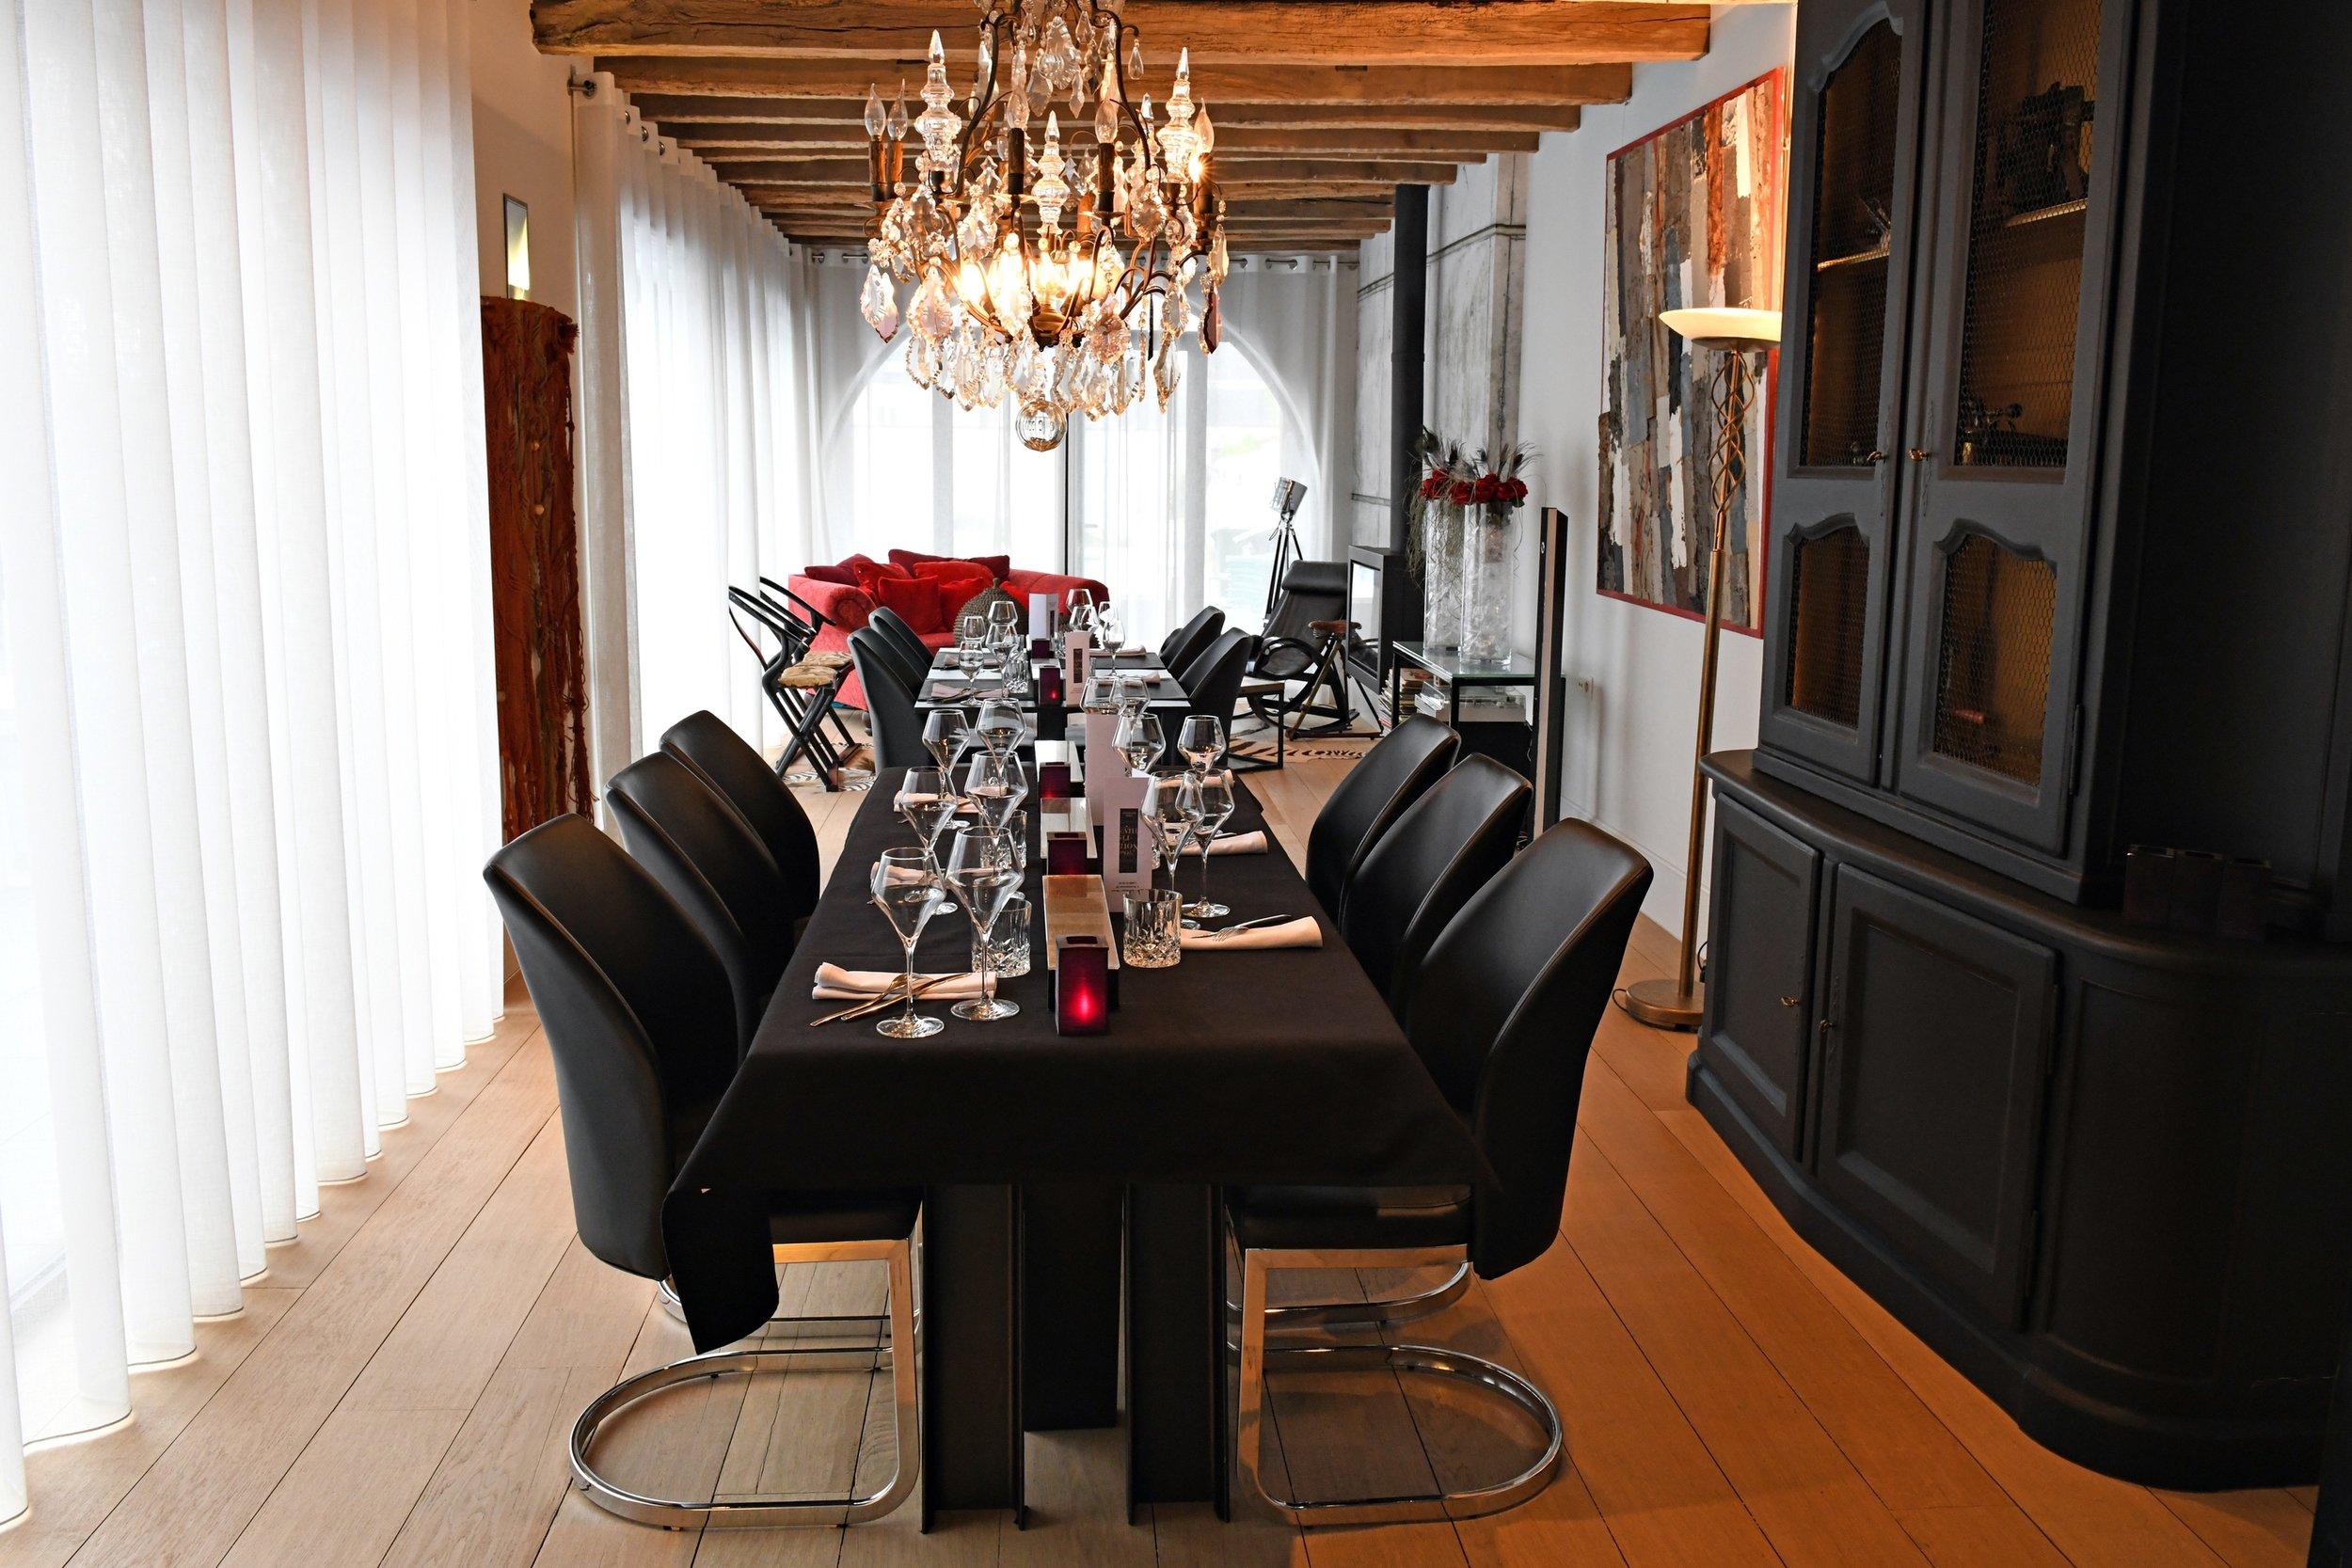 13 restaurant brasserie oud notarishuis ninove bart albrecht tablefever .jpg